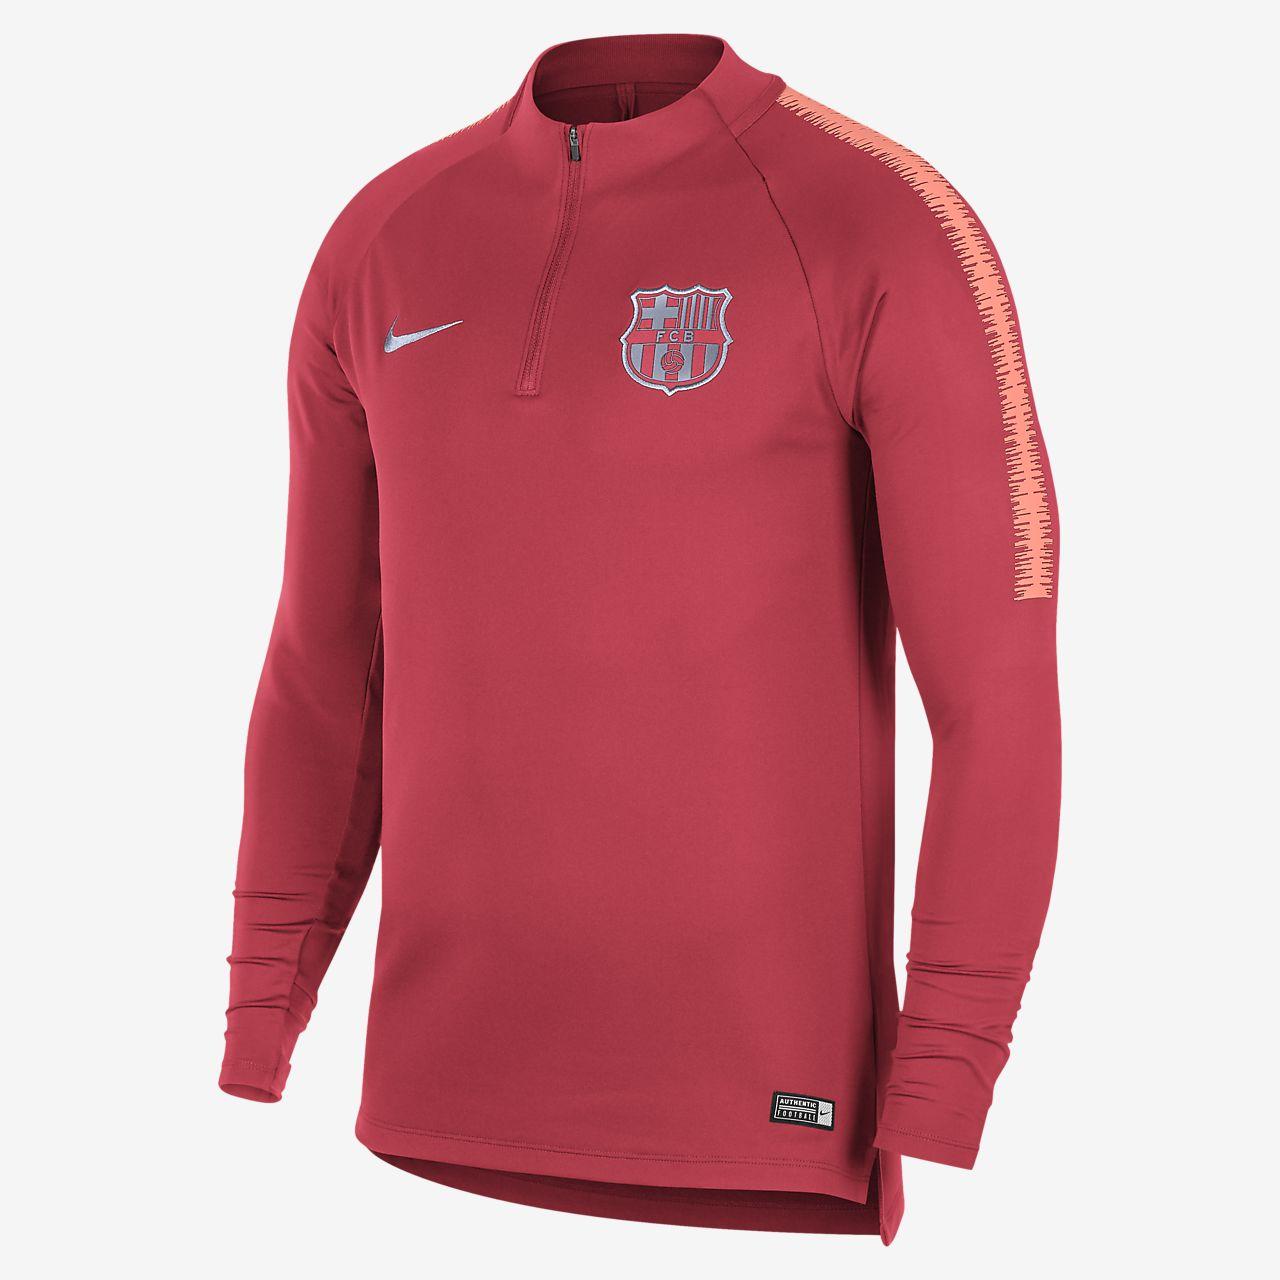 903c62c0 FC Barcelona Dri-FIT Squad Drill Men's Long Sleeve Soccer Top. Nike.com